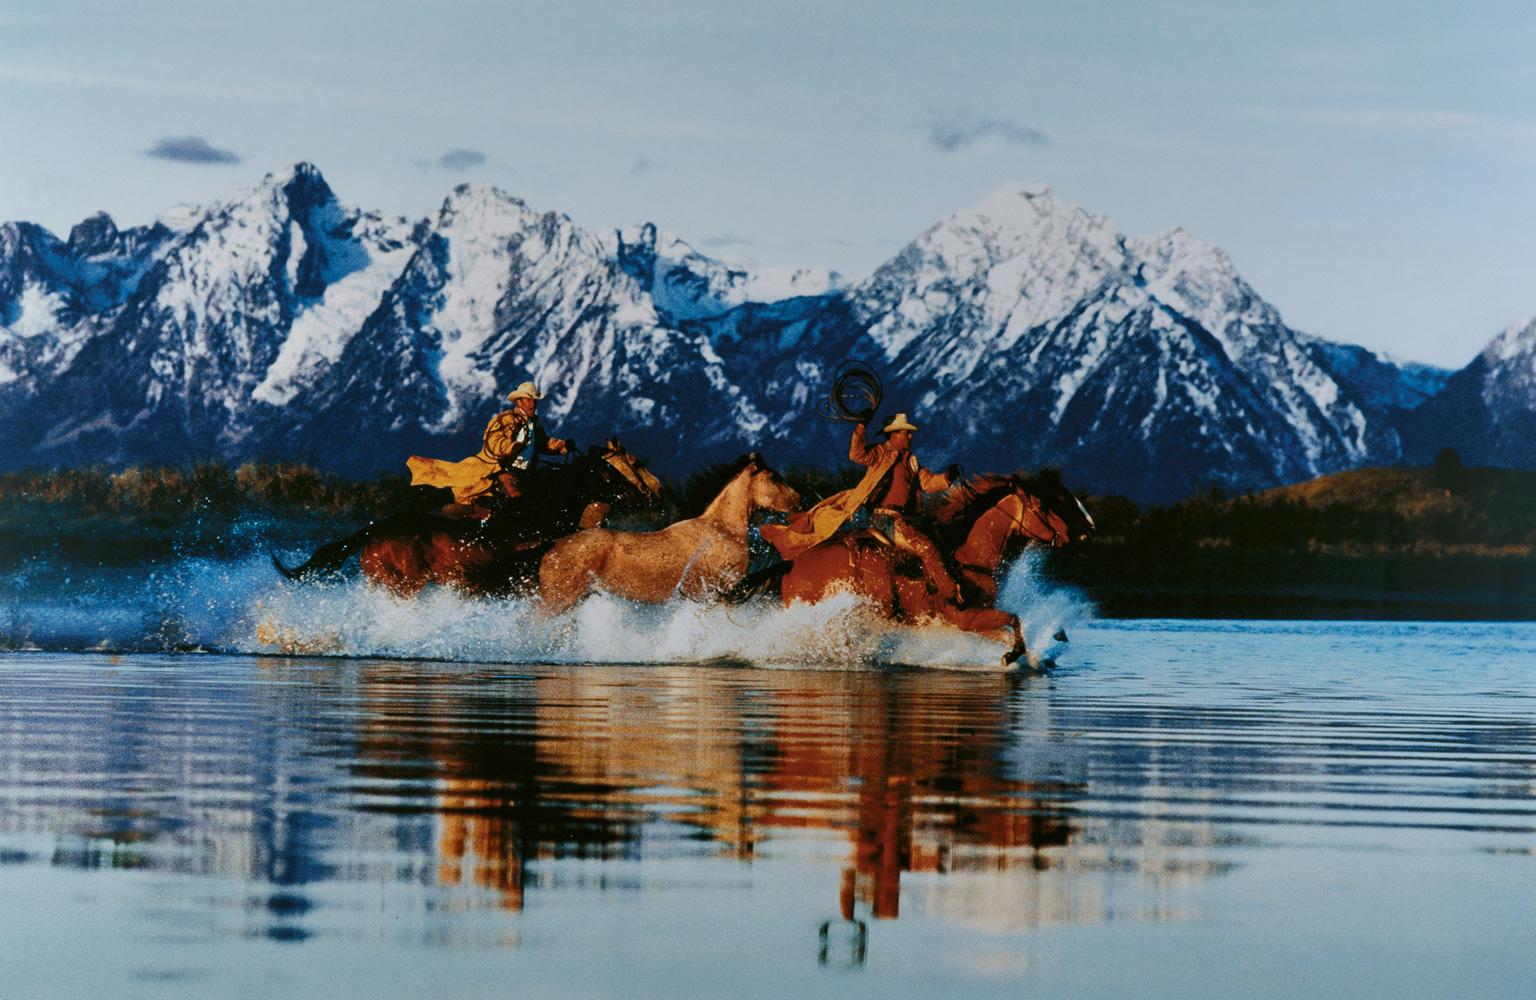 Richard Prince, Untitled (cowboy), 1998, color photography, photo: Wilfried Petzi